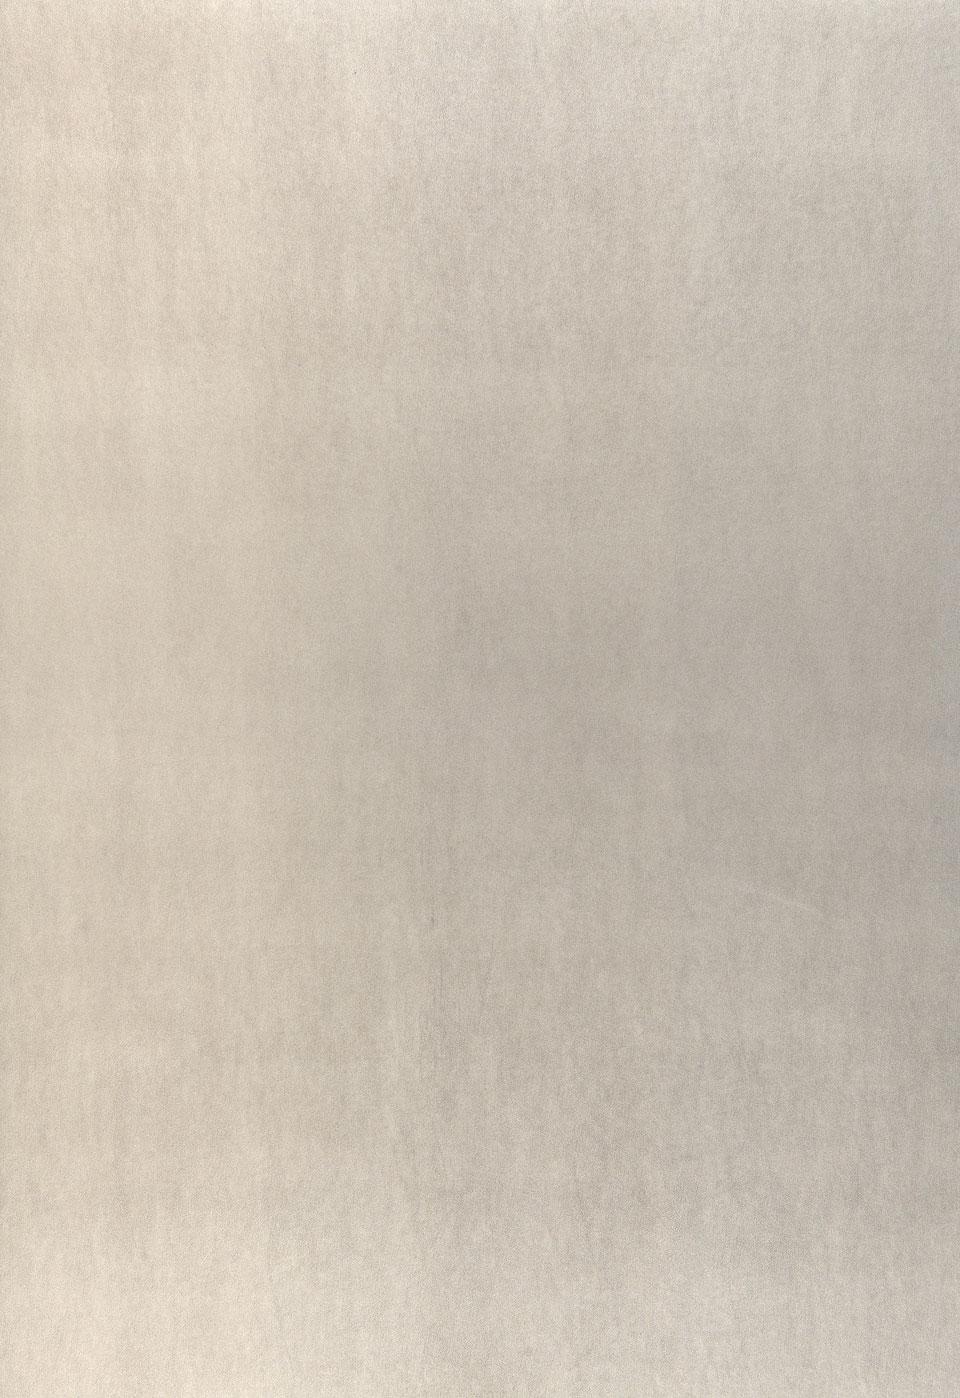 Американские обои Schumacher,  коллекция Luxe Lodge, артикул5006310